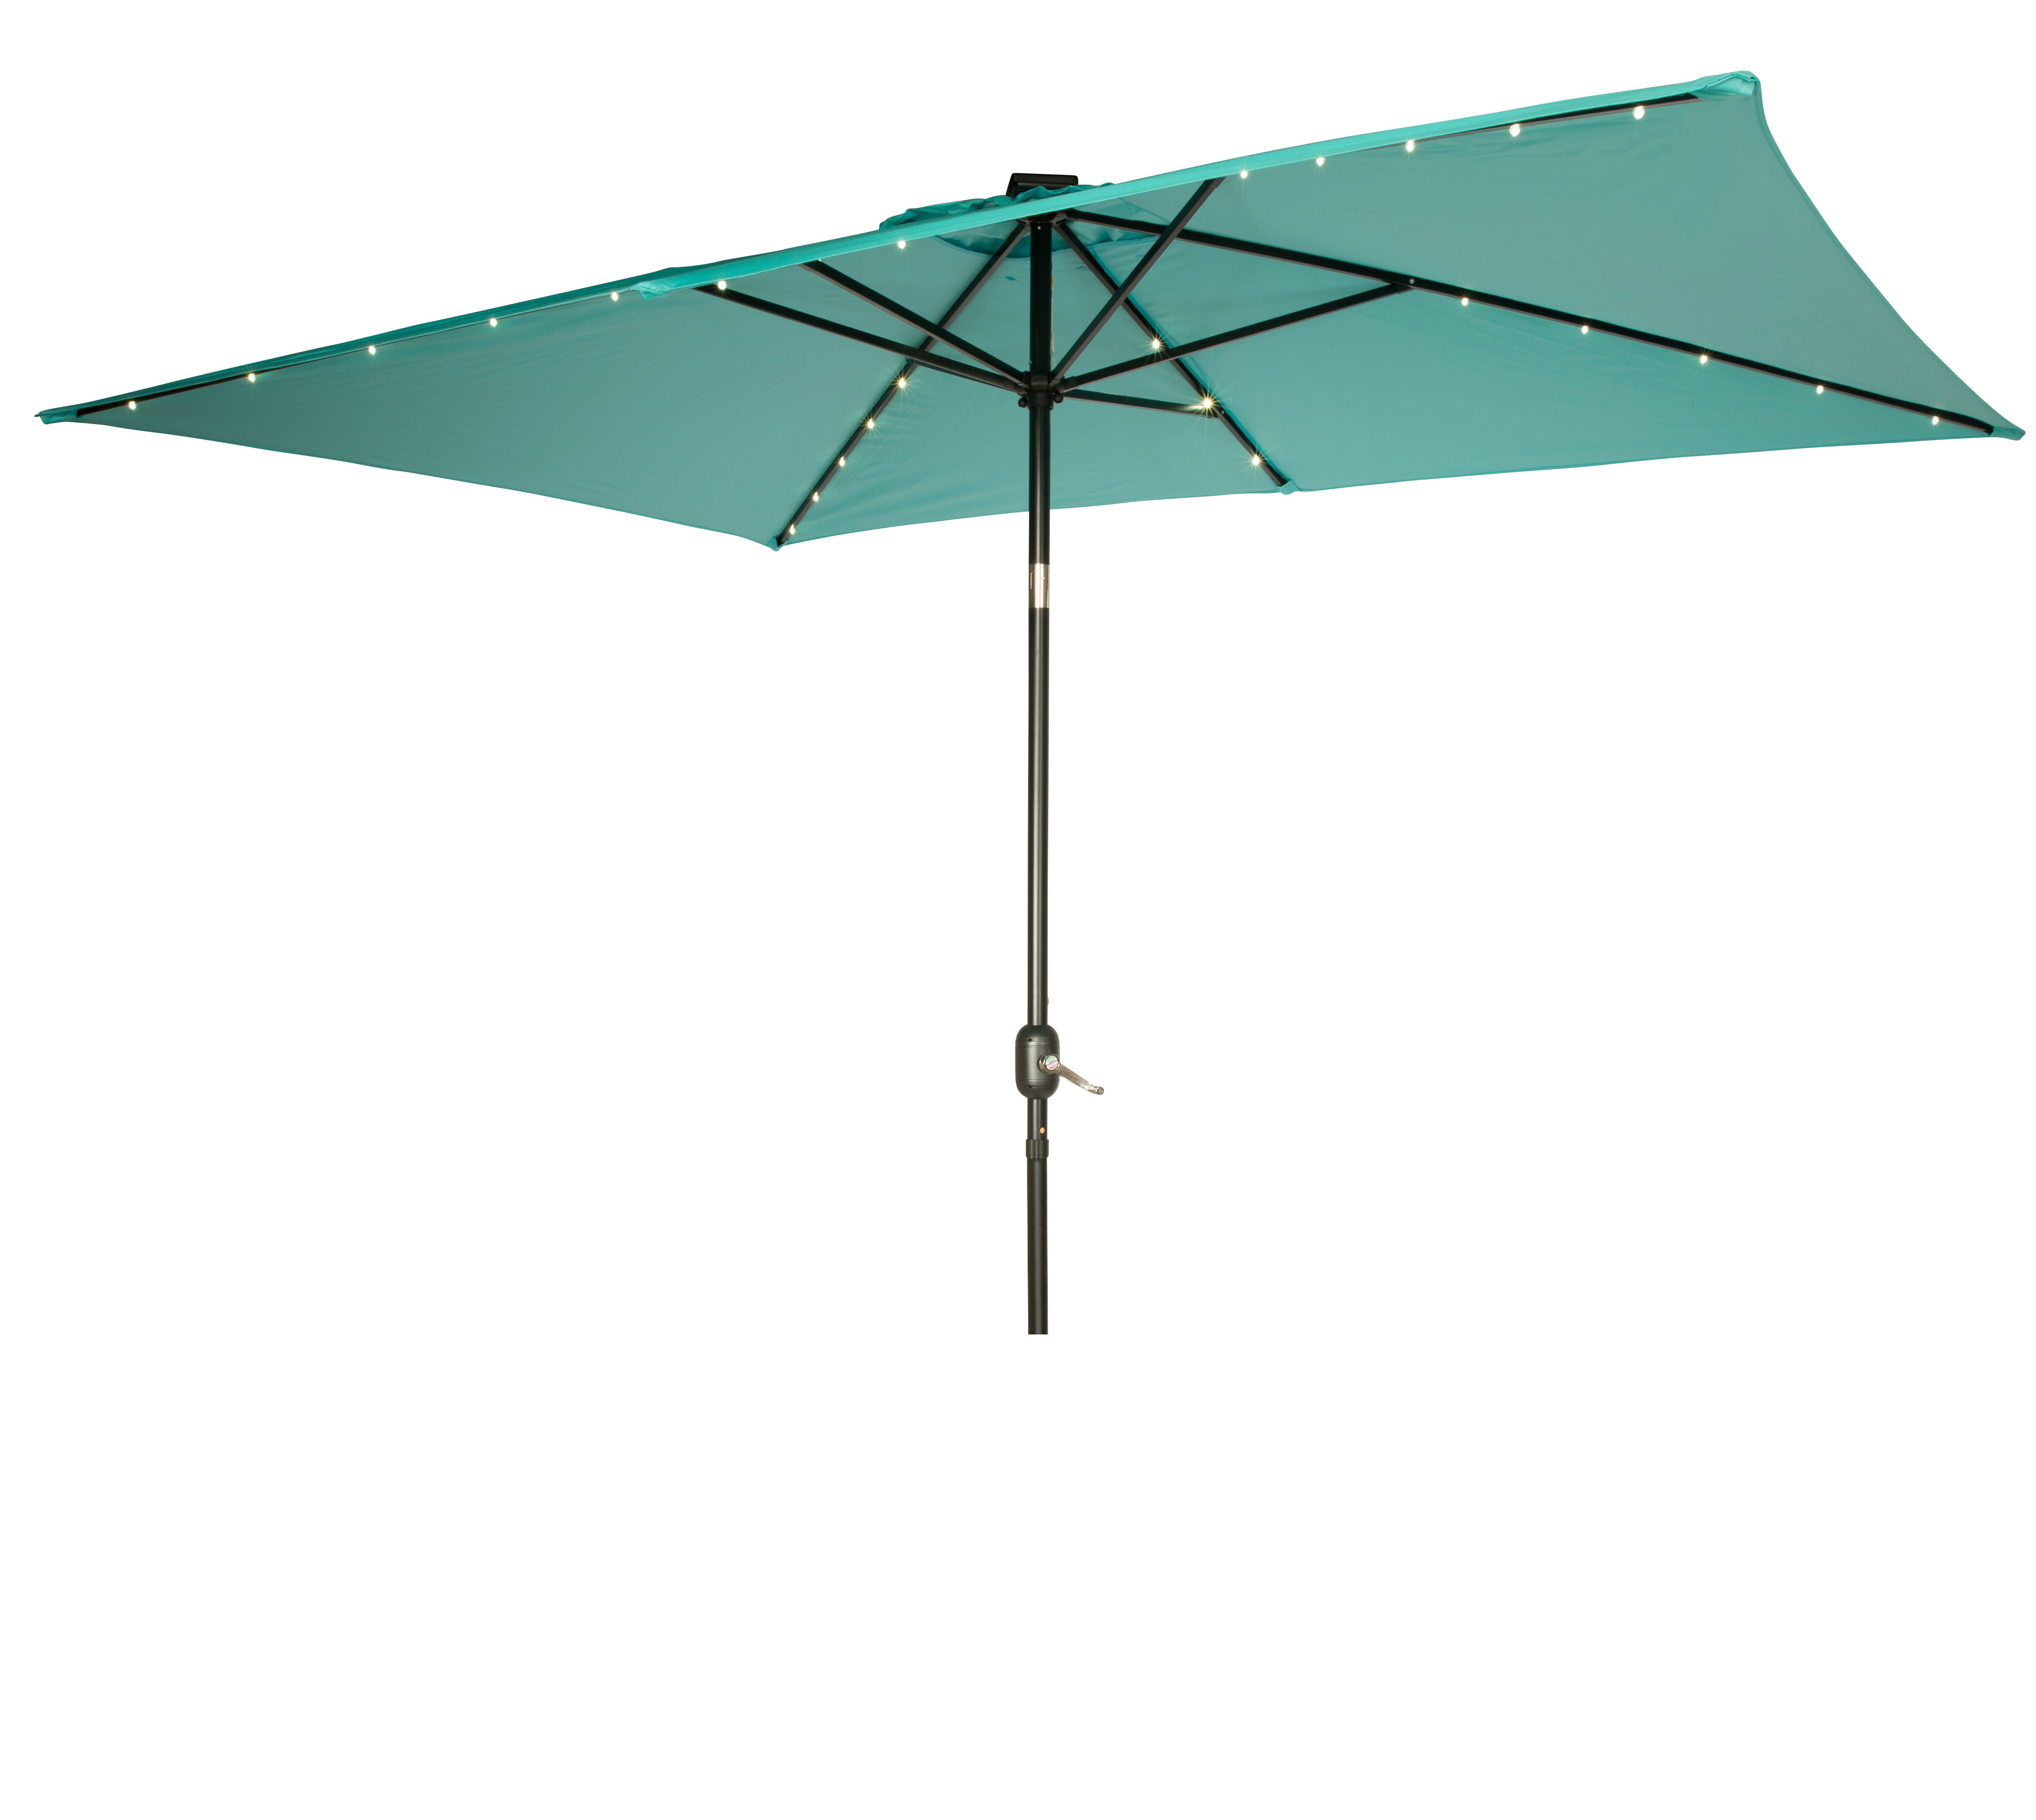 Mertie 10' X 6.5' Rectangular Market Umbrella With Regard To 2019 Griselda Solar Lighted  Rectangular Market Umbrellas (Gallery 11 of 20)